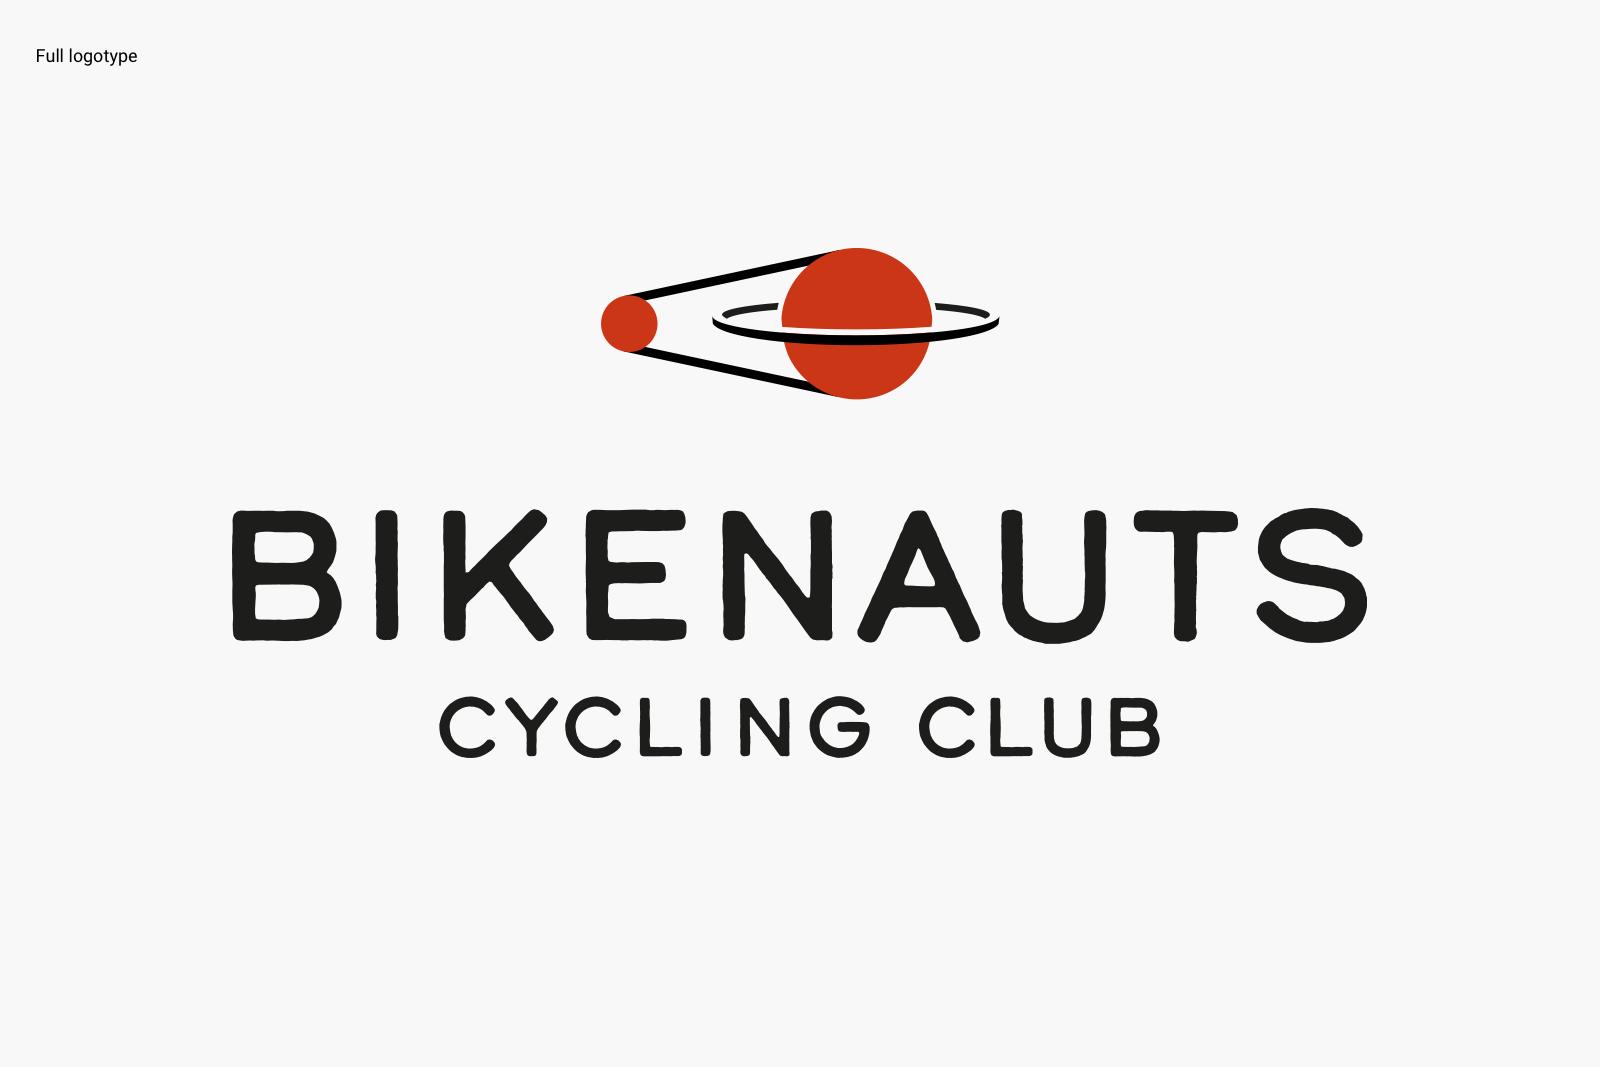 bikenauts_full_logotype.png